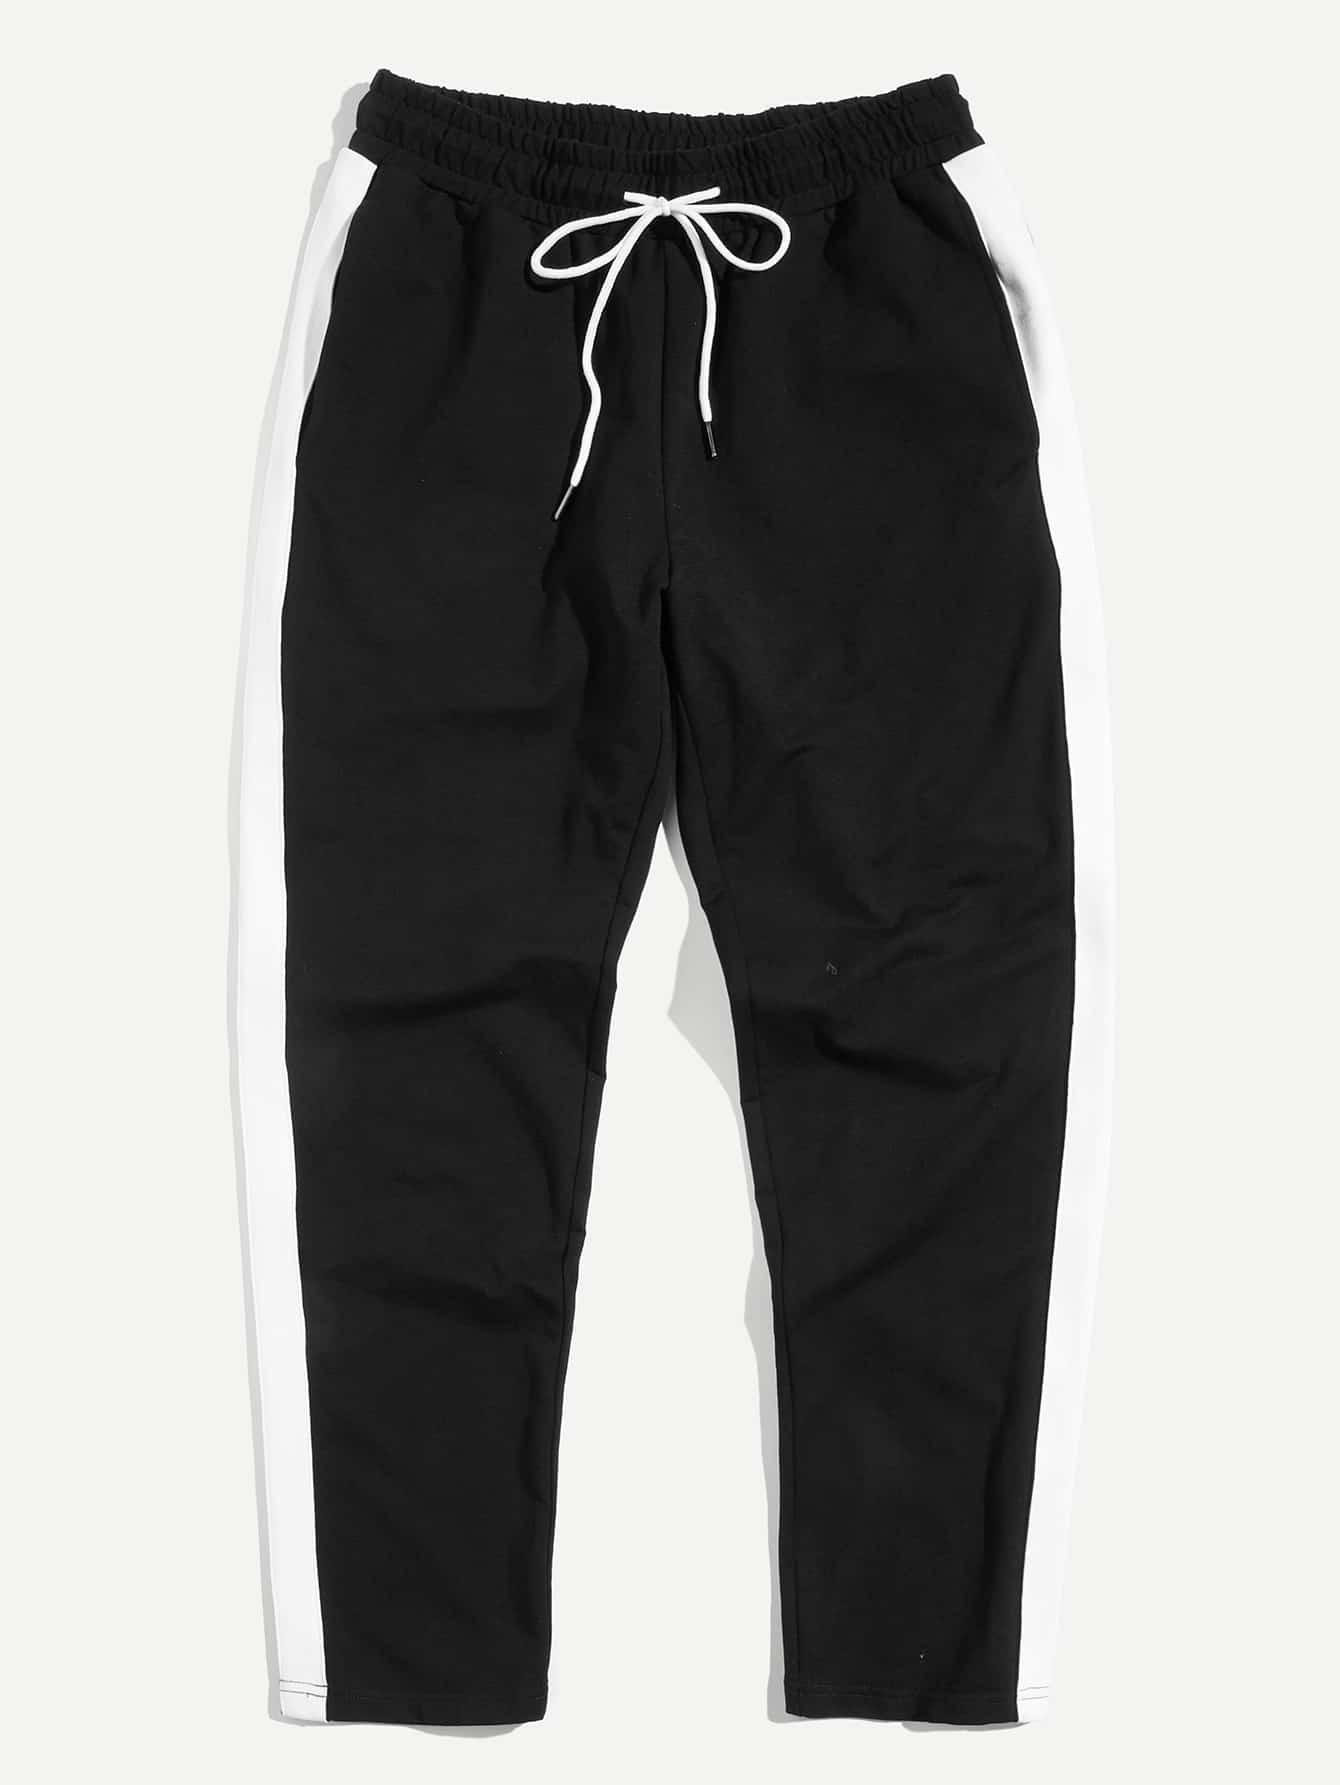 Men Contrast Tape Side Drawstring Waist Sweatpants contrast striped side sweatpants